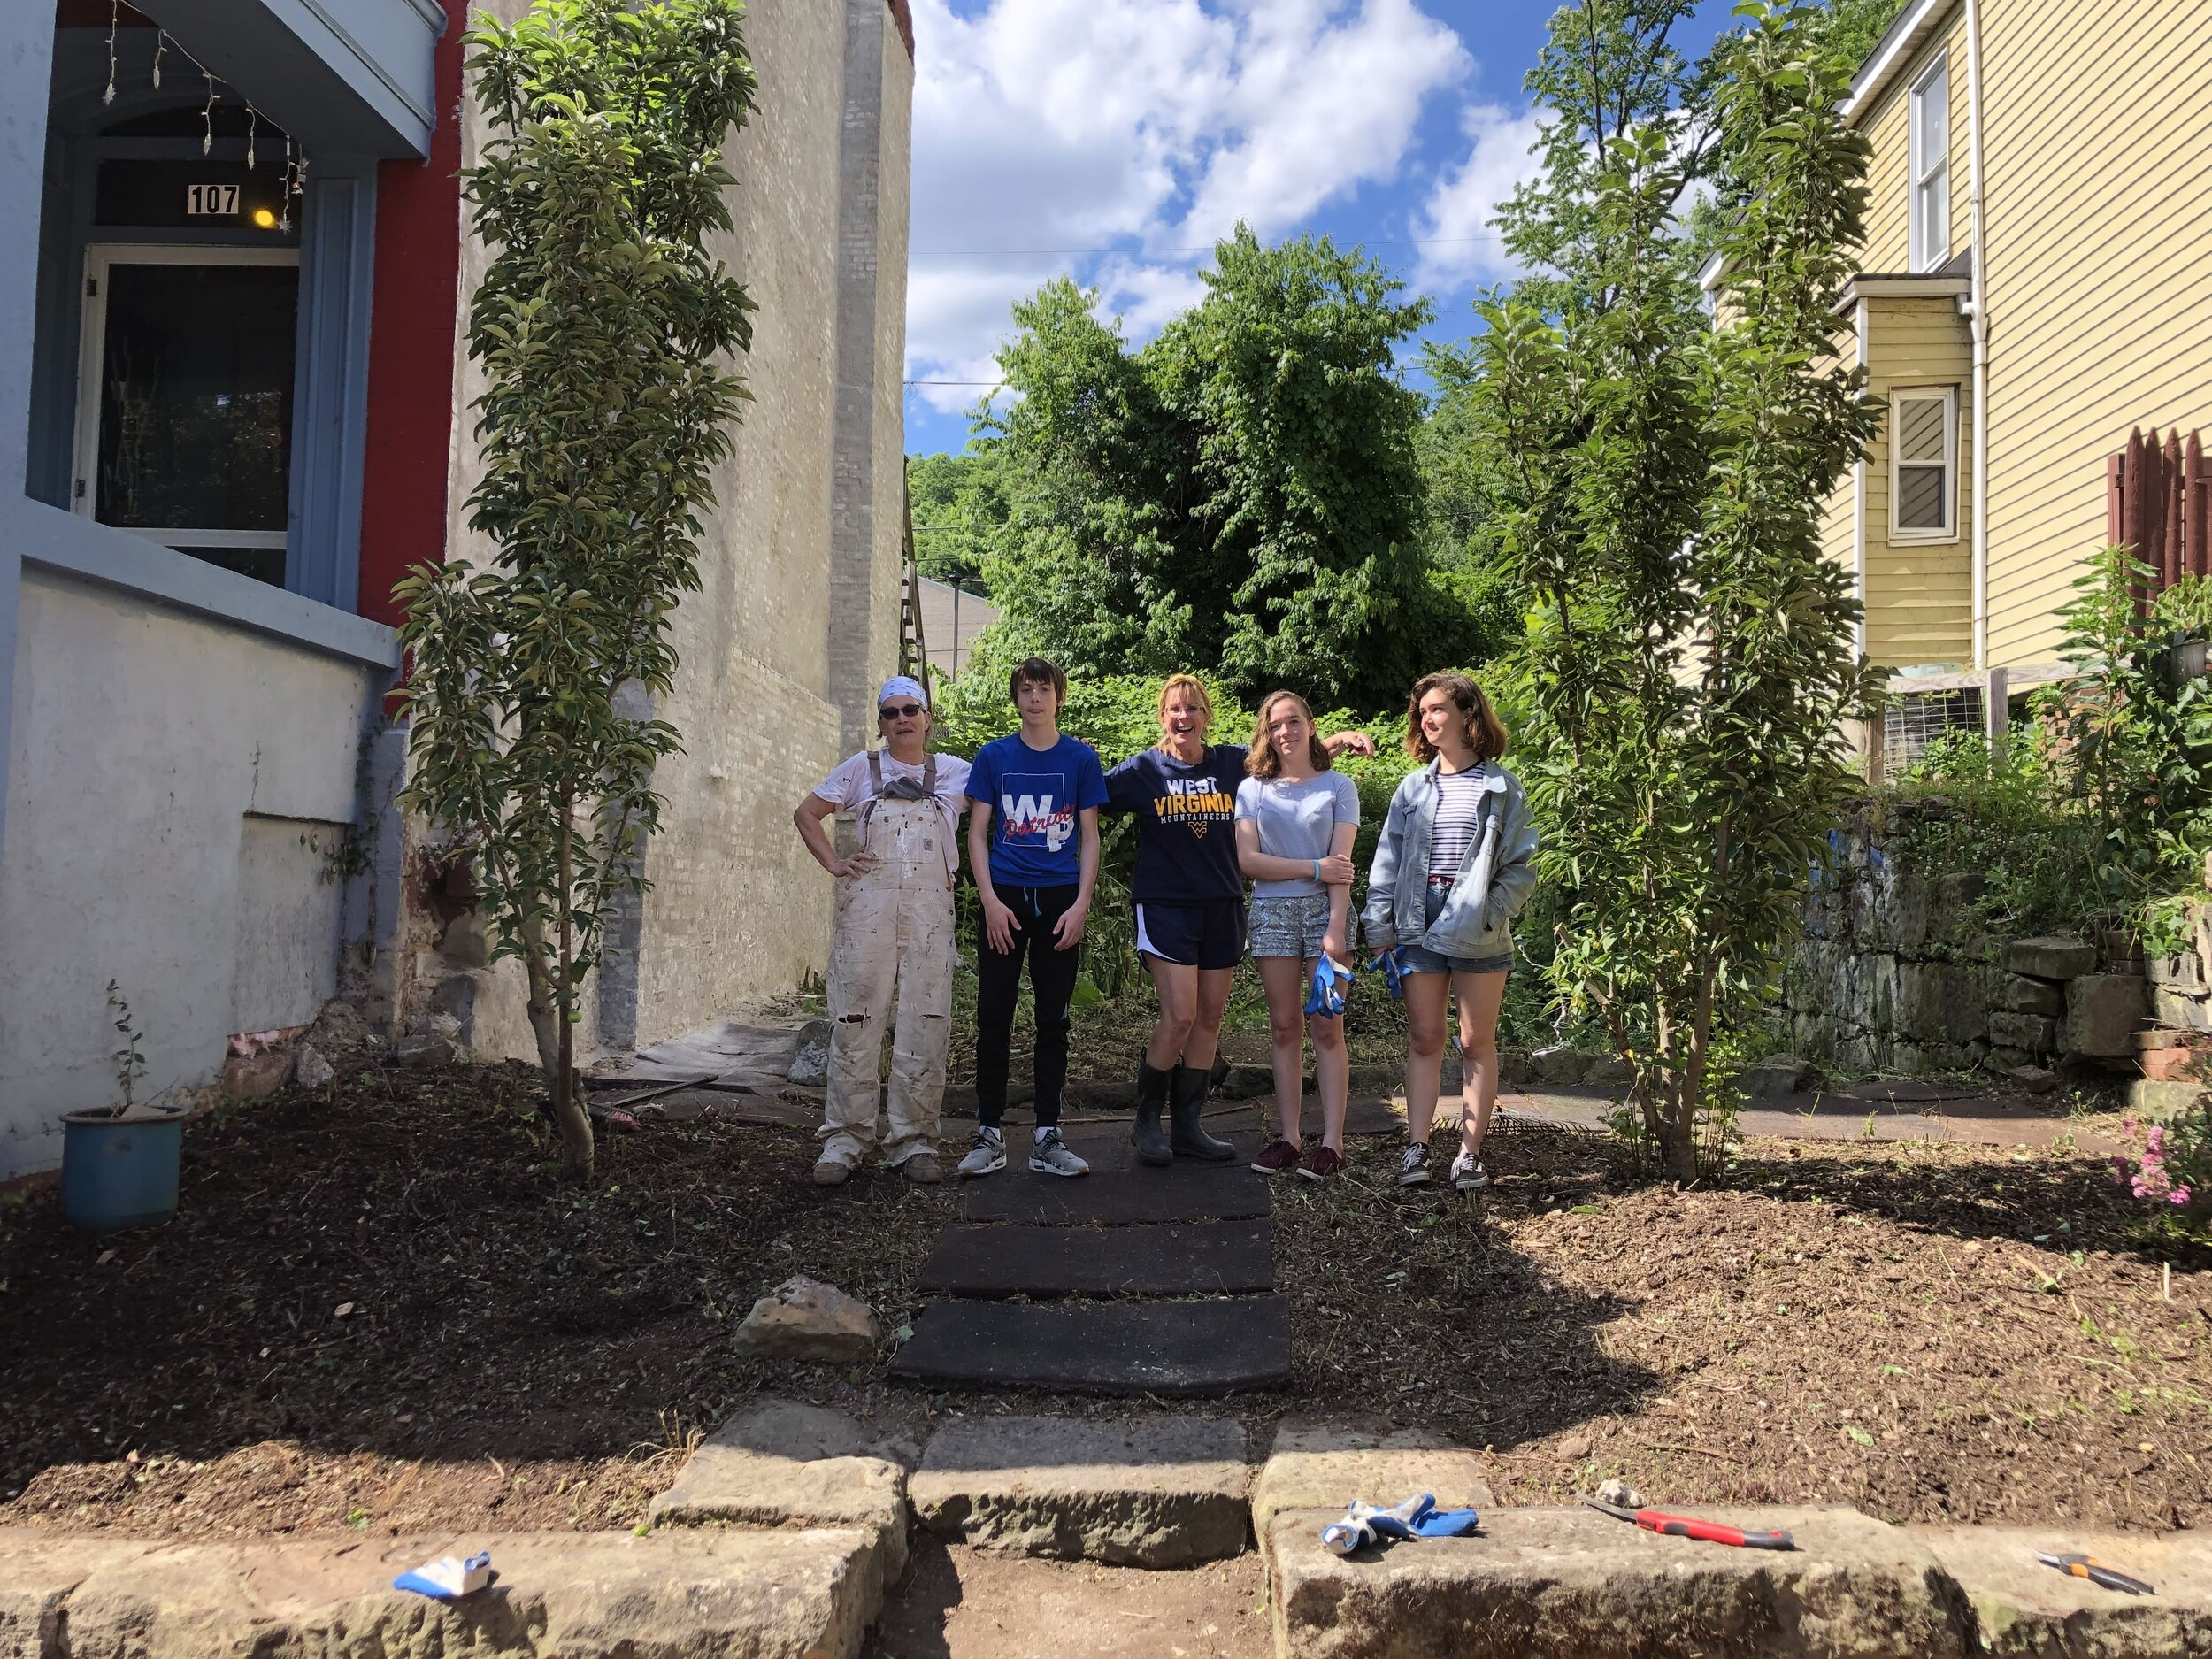 Beautiful neighborhoods matter to street moms. Some youth in the neighborhood volunteered to help.